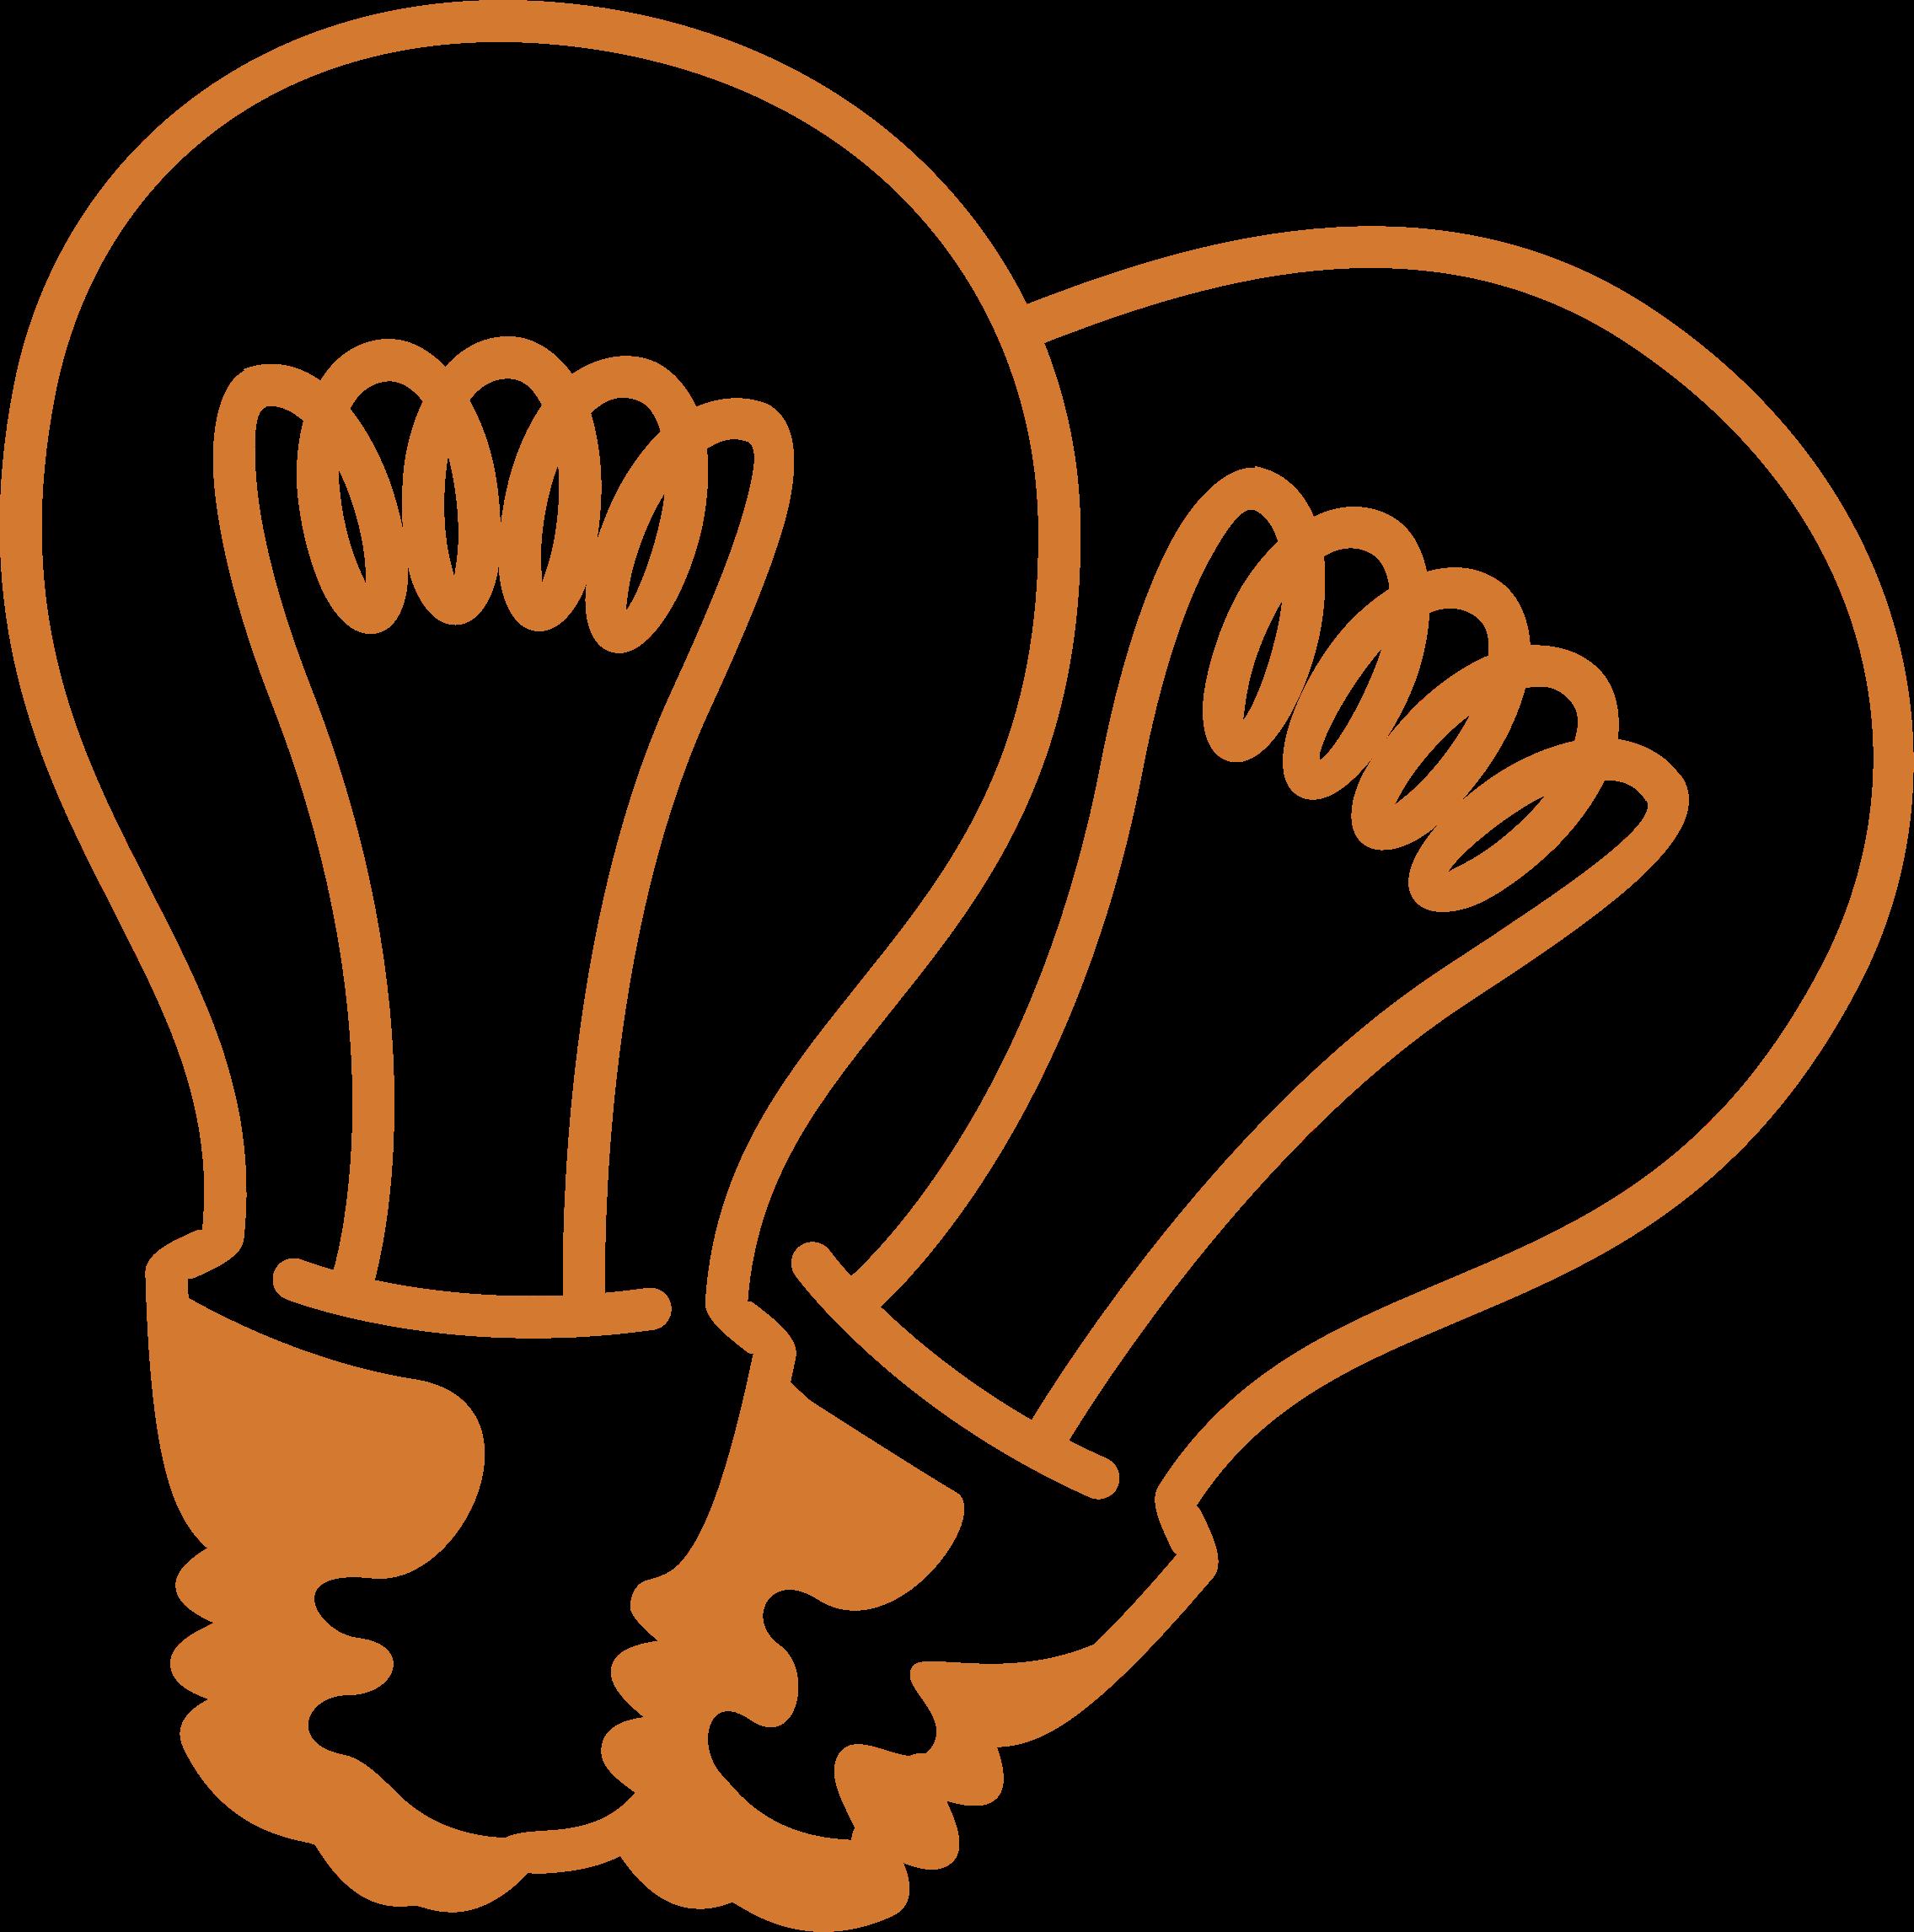 Filaments clipart #16, Download drawings